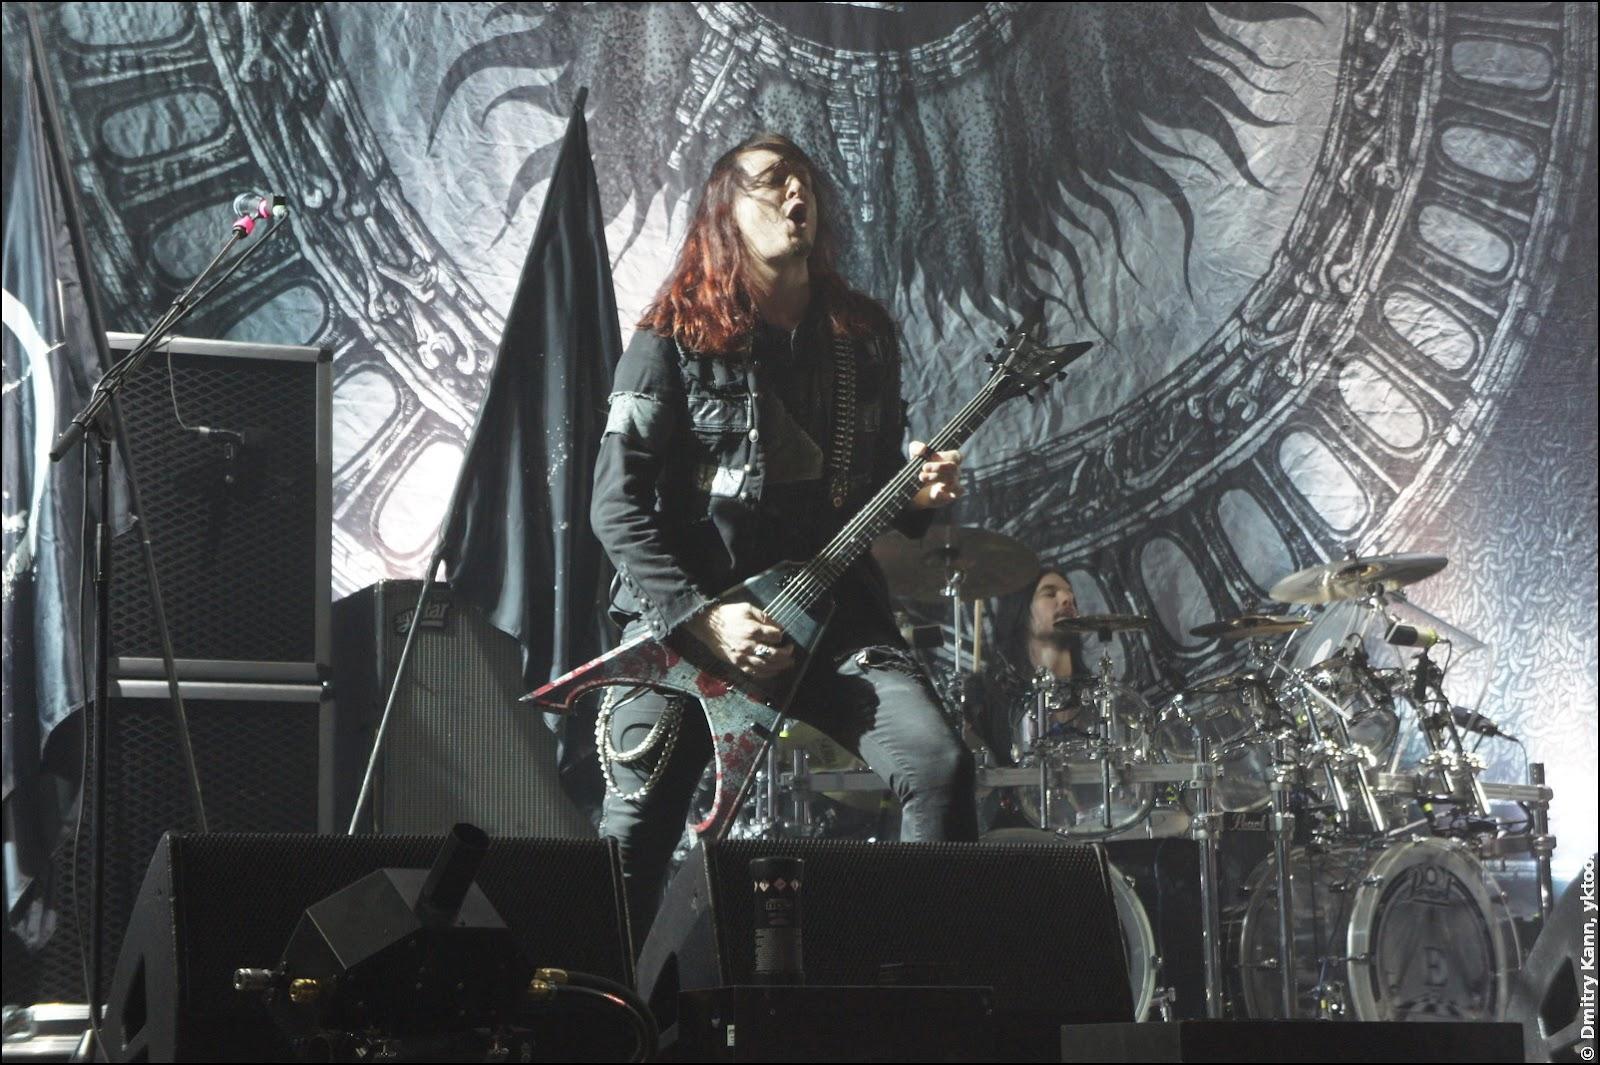 Arch Enemy: Michael Amott, в глубине затаился ударник Daniel Erlandsson.